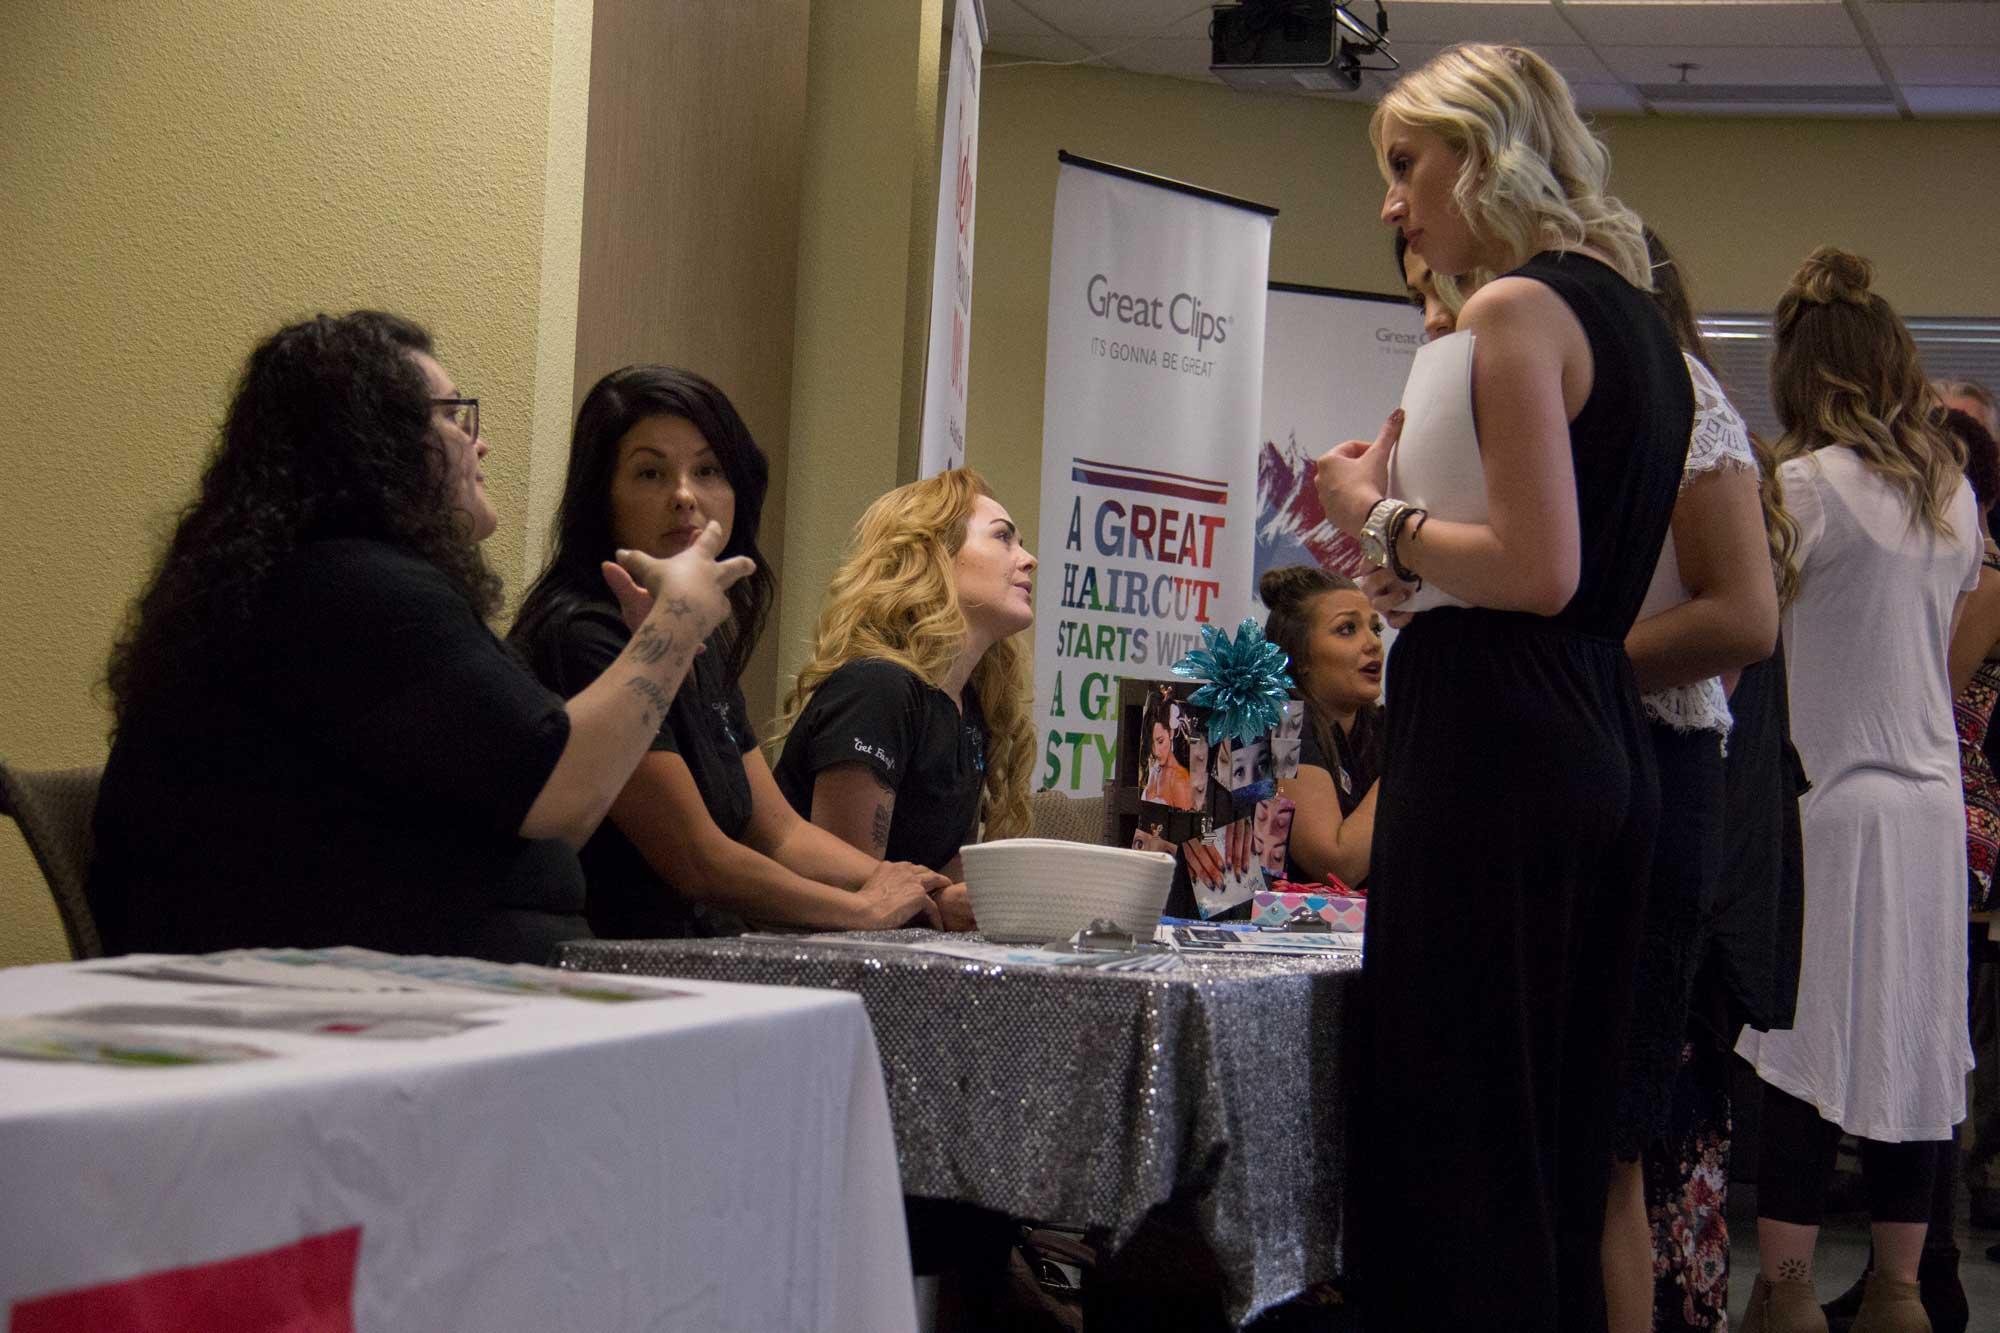 20 Salons Participate in Fort Collins Campus Career Fair